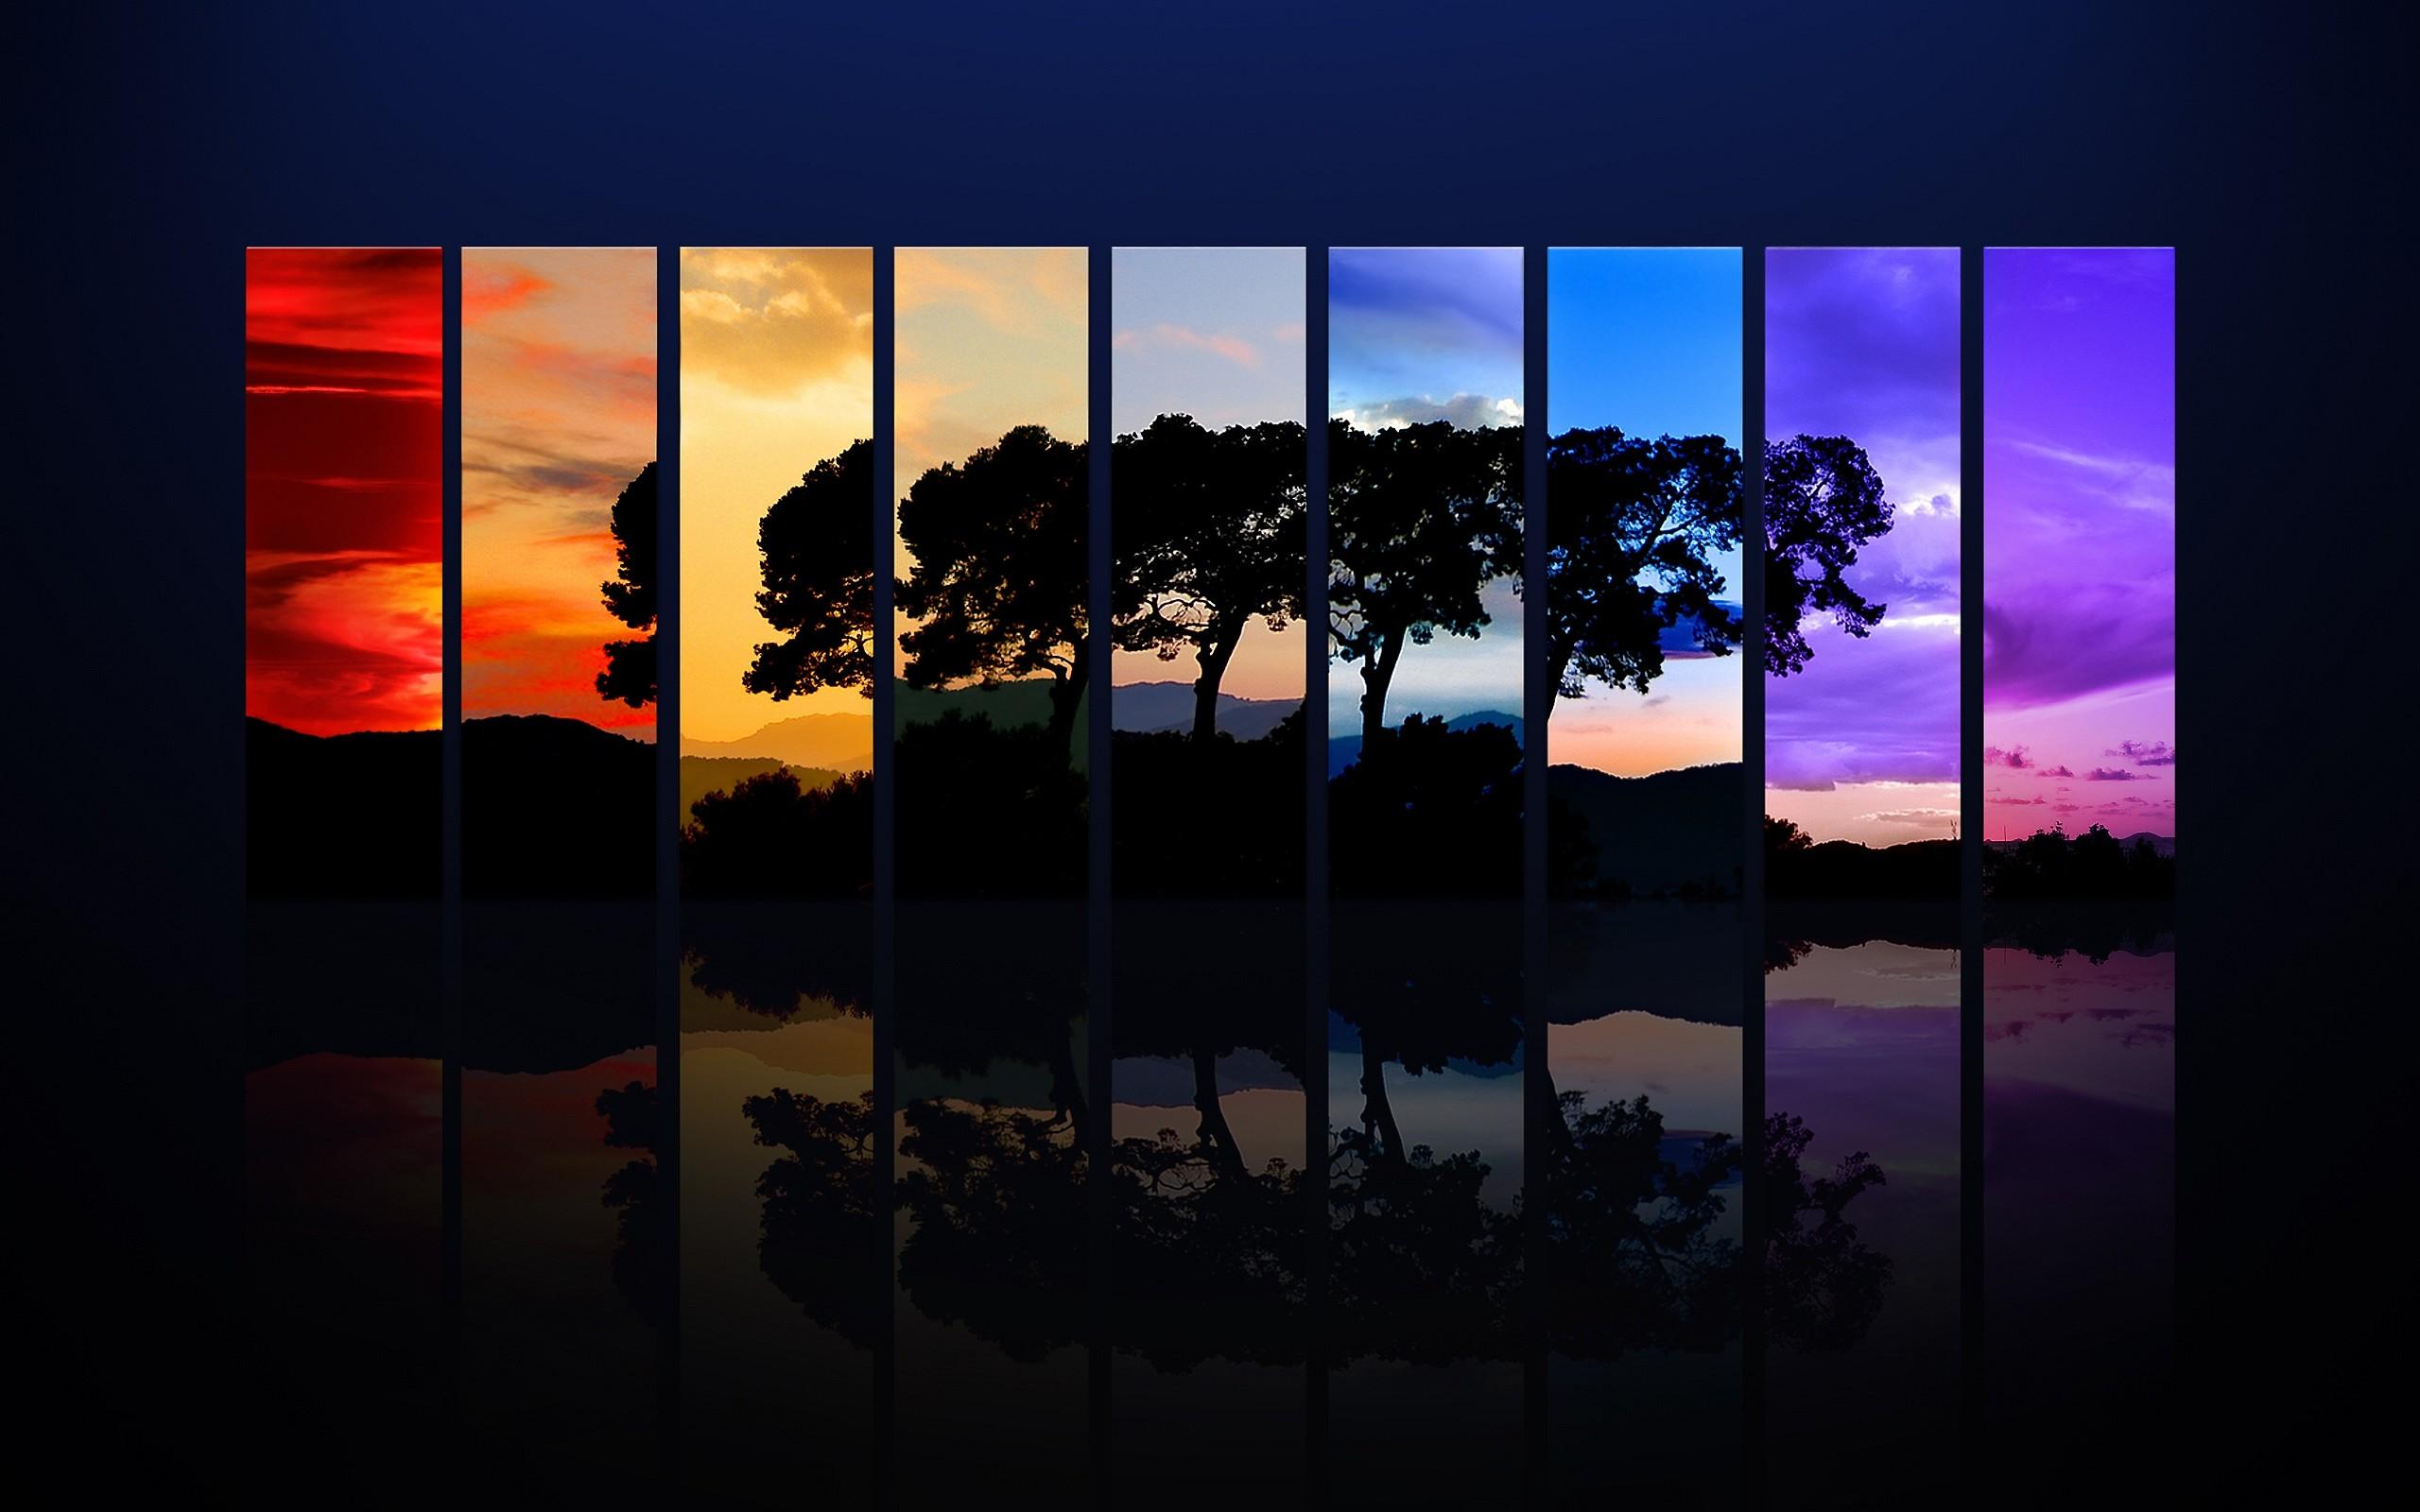 1920×1080 px; 3736549 Awesome Desktop Wallpaper, LifeWallpapers